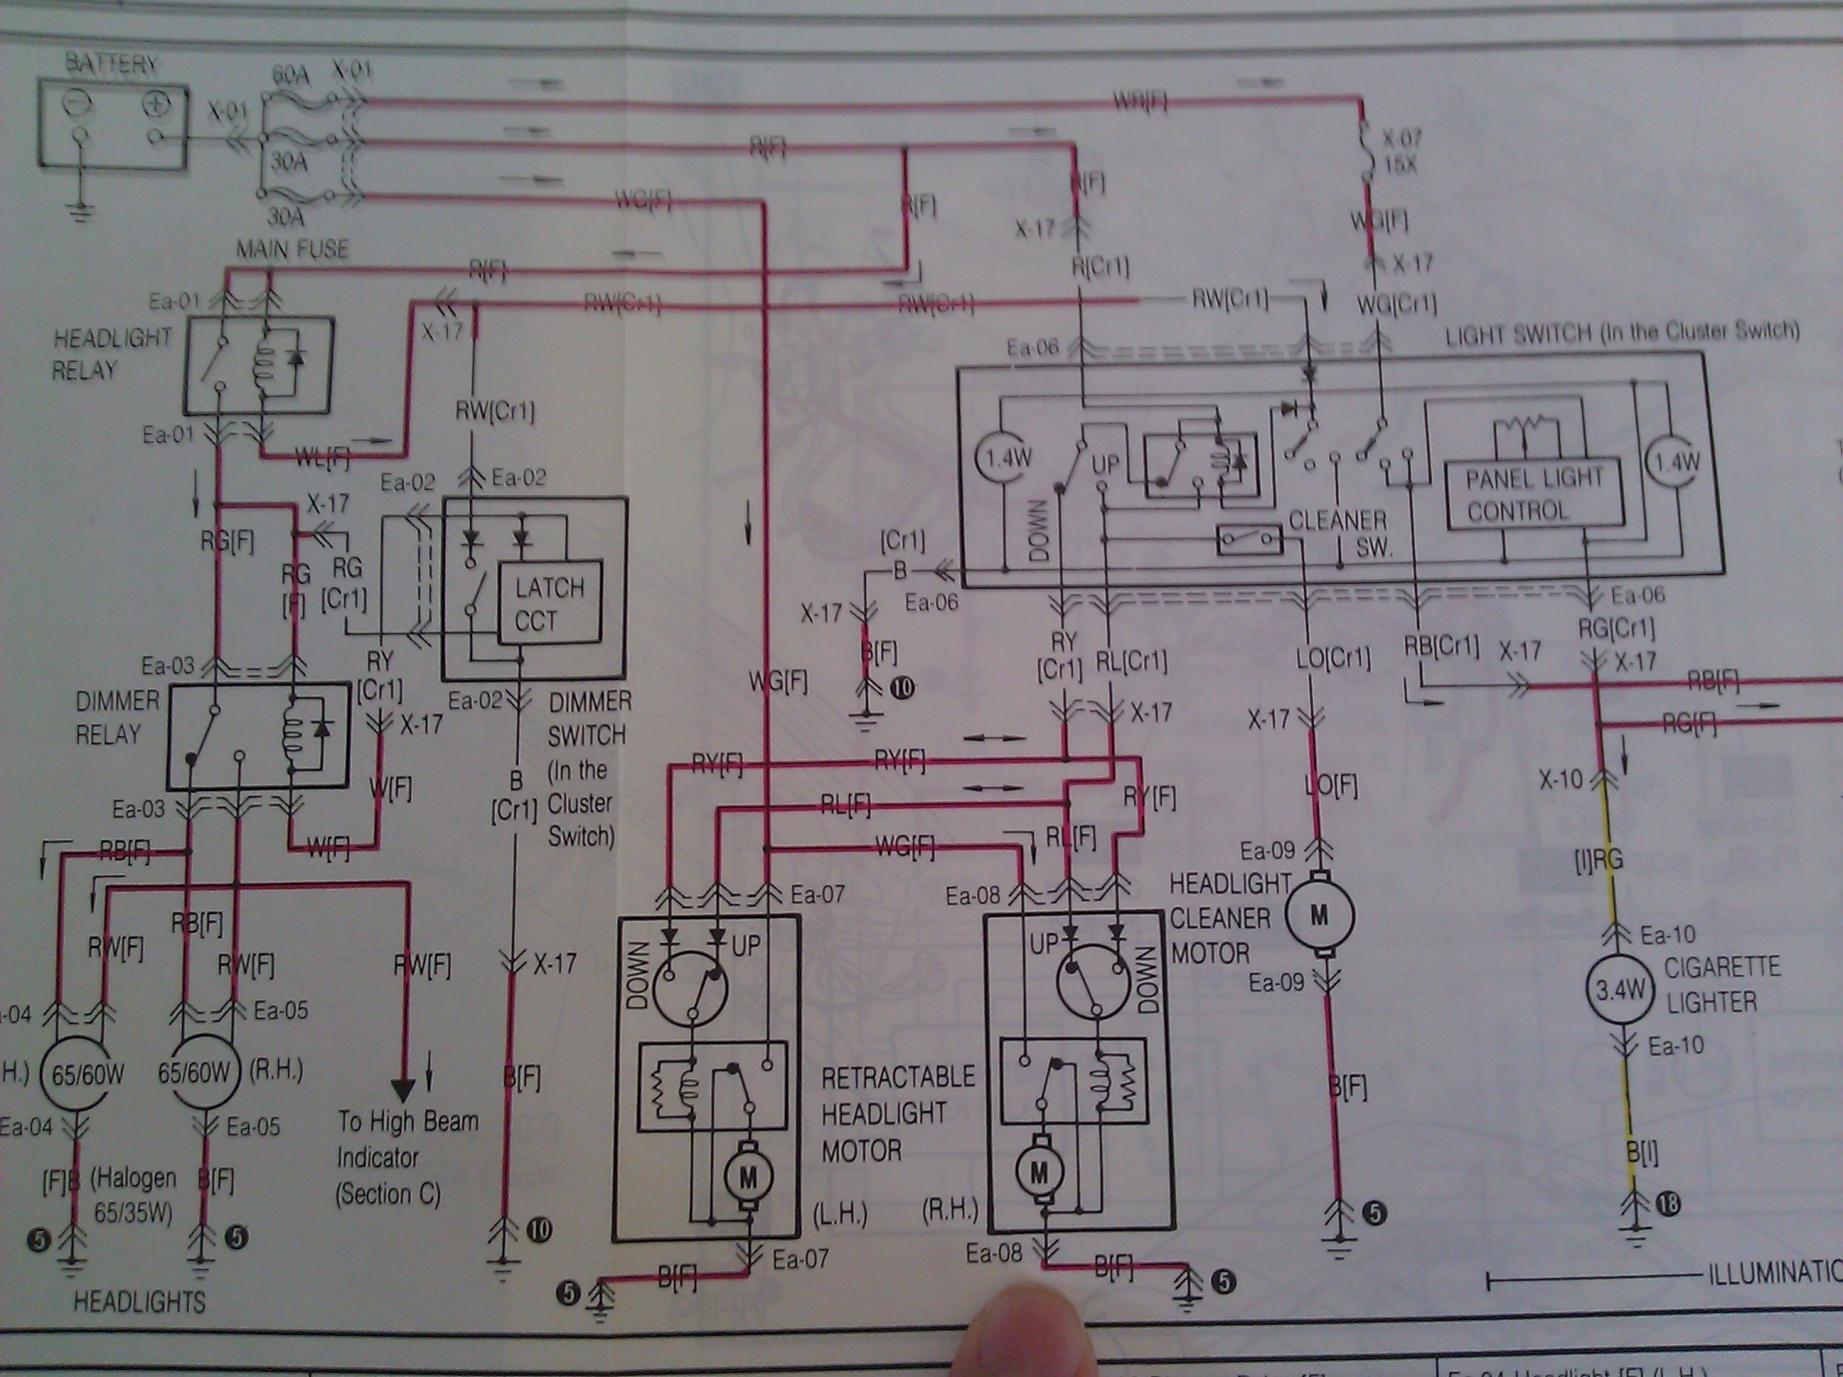 hight resolution of headlight motor techical data rx7club com mazda rx7 forum 1986 rx7 wiring diagram for headlights